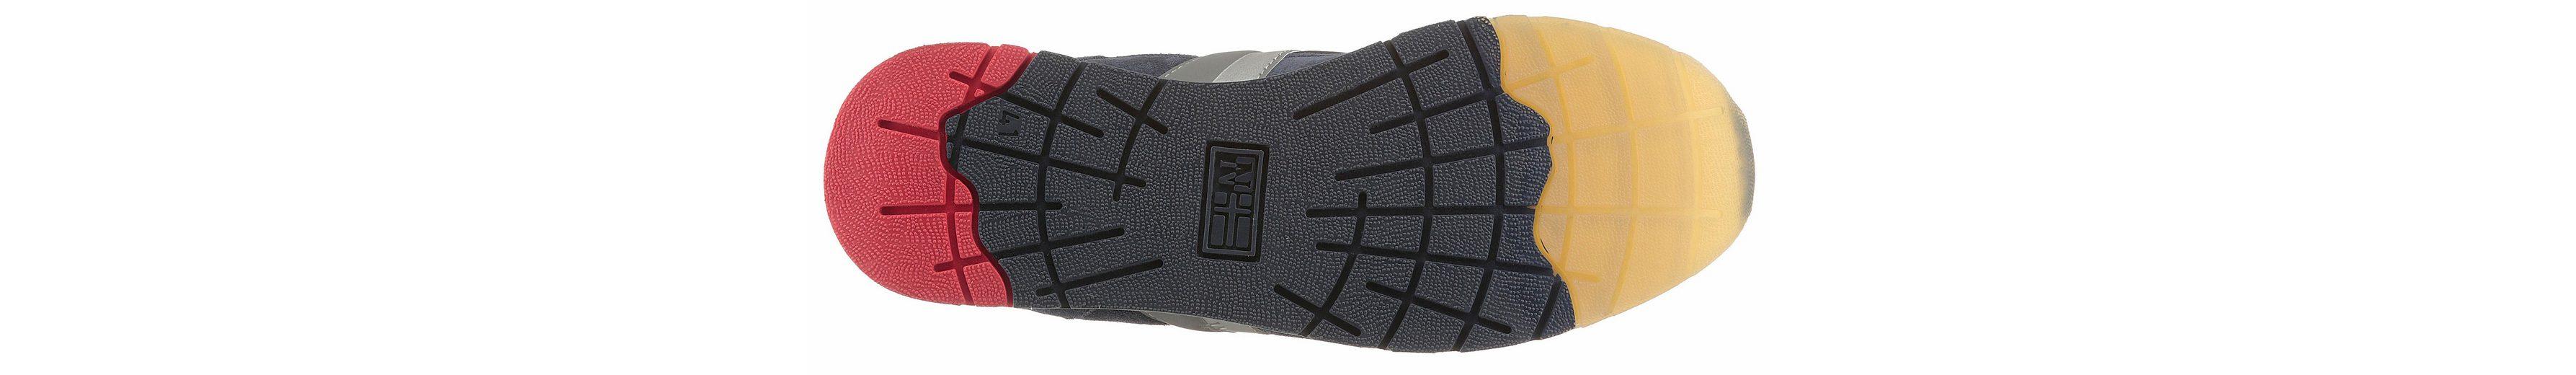 Napapijri Sneaker, im Materialmix